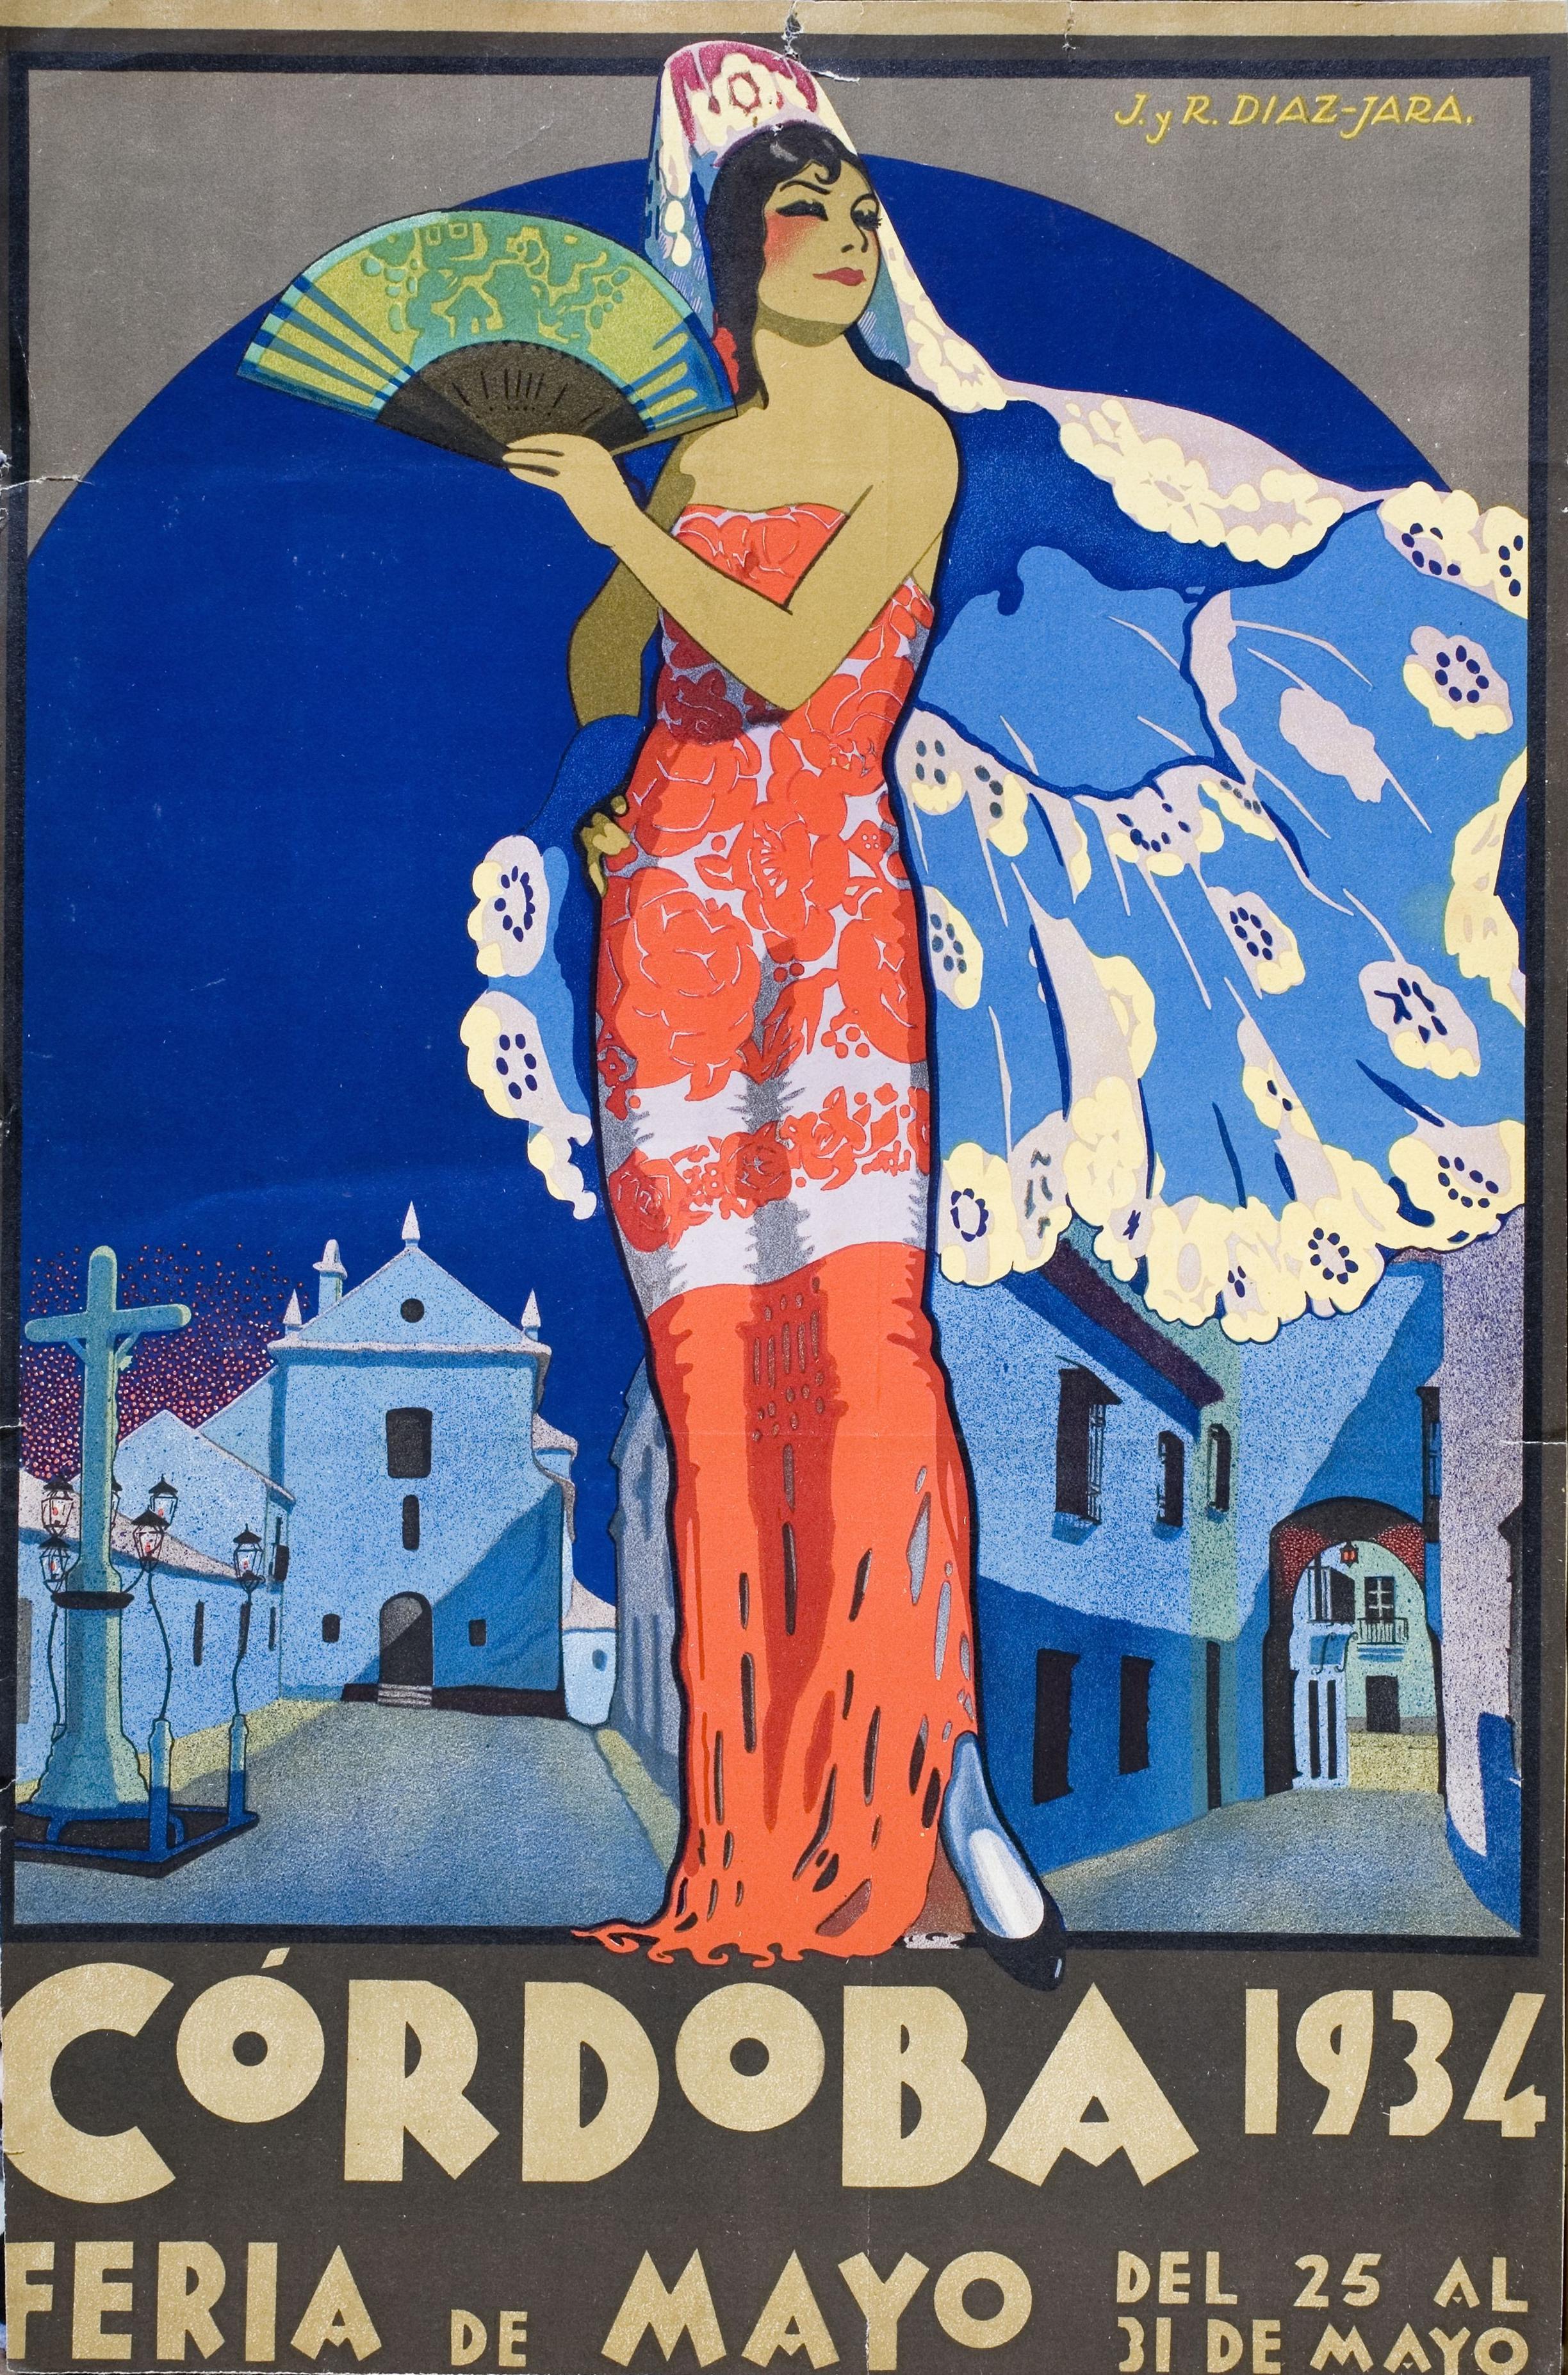 Cartel de la feria de Córdoba 1934